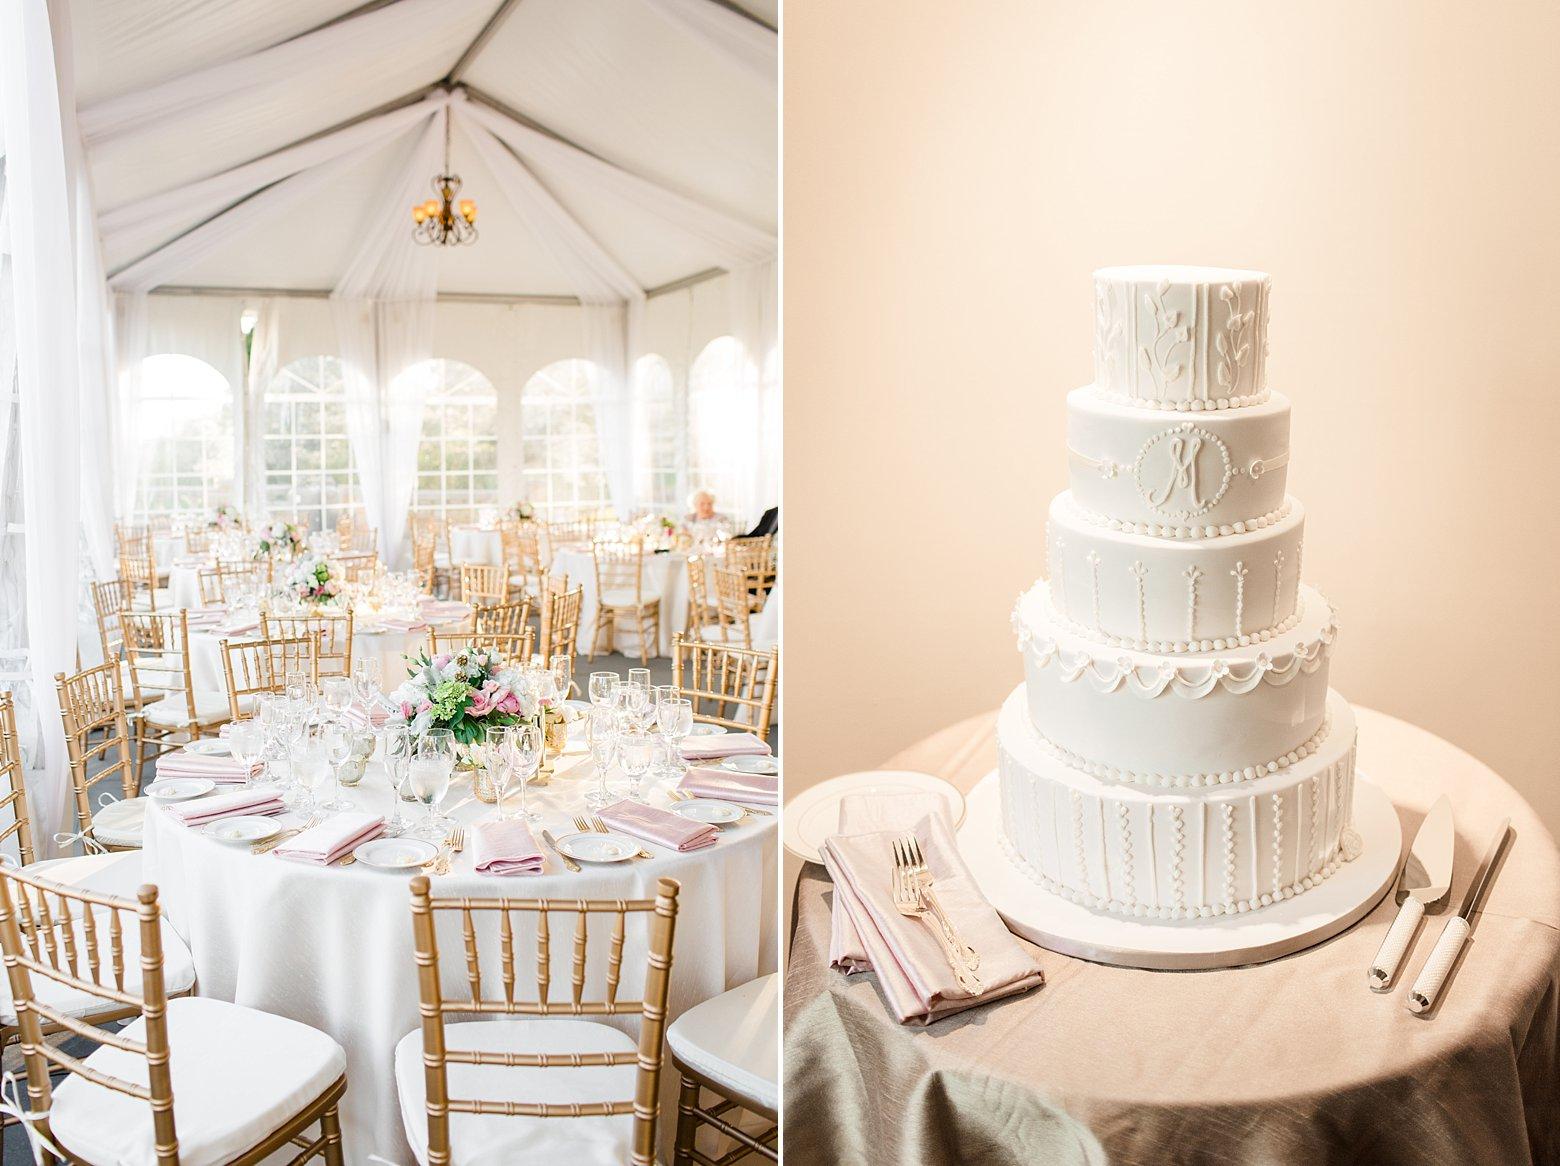 lauren_fair_photography_april_lynn_designs_stasia_matt_spring_cairnwood_estate_wedding_northeast_philadelphia_blush_pink_gold_wedding_invitation_stationery_0155